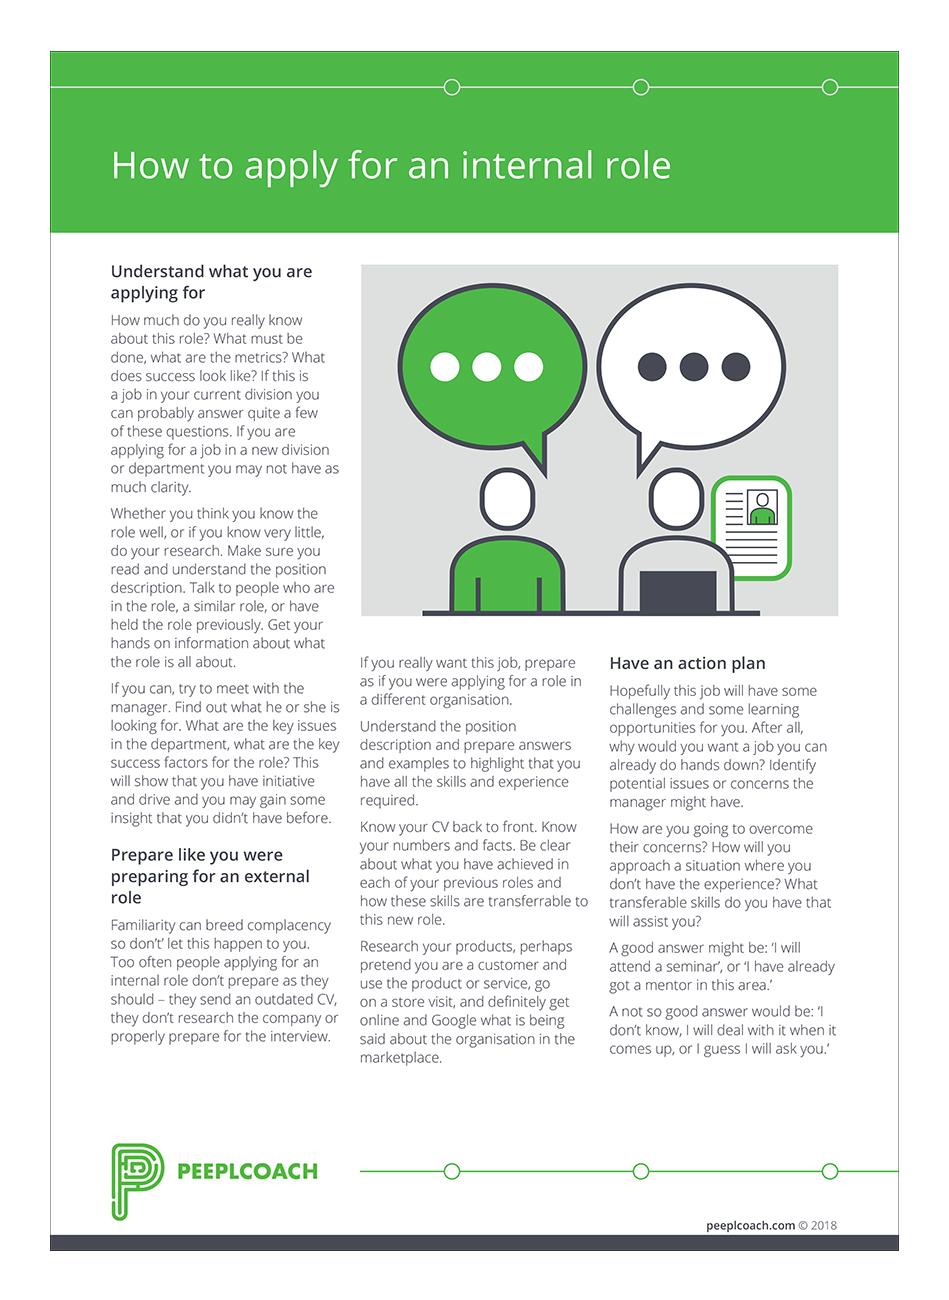 Peeplcoach-information-sheets-graphic-design-2.jpg